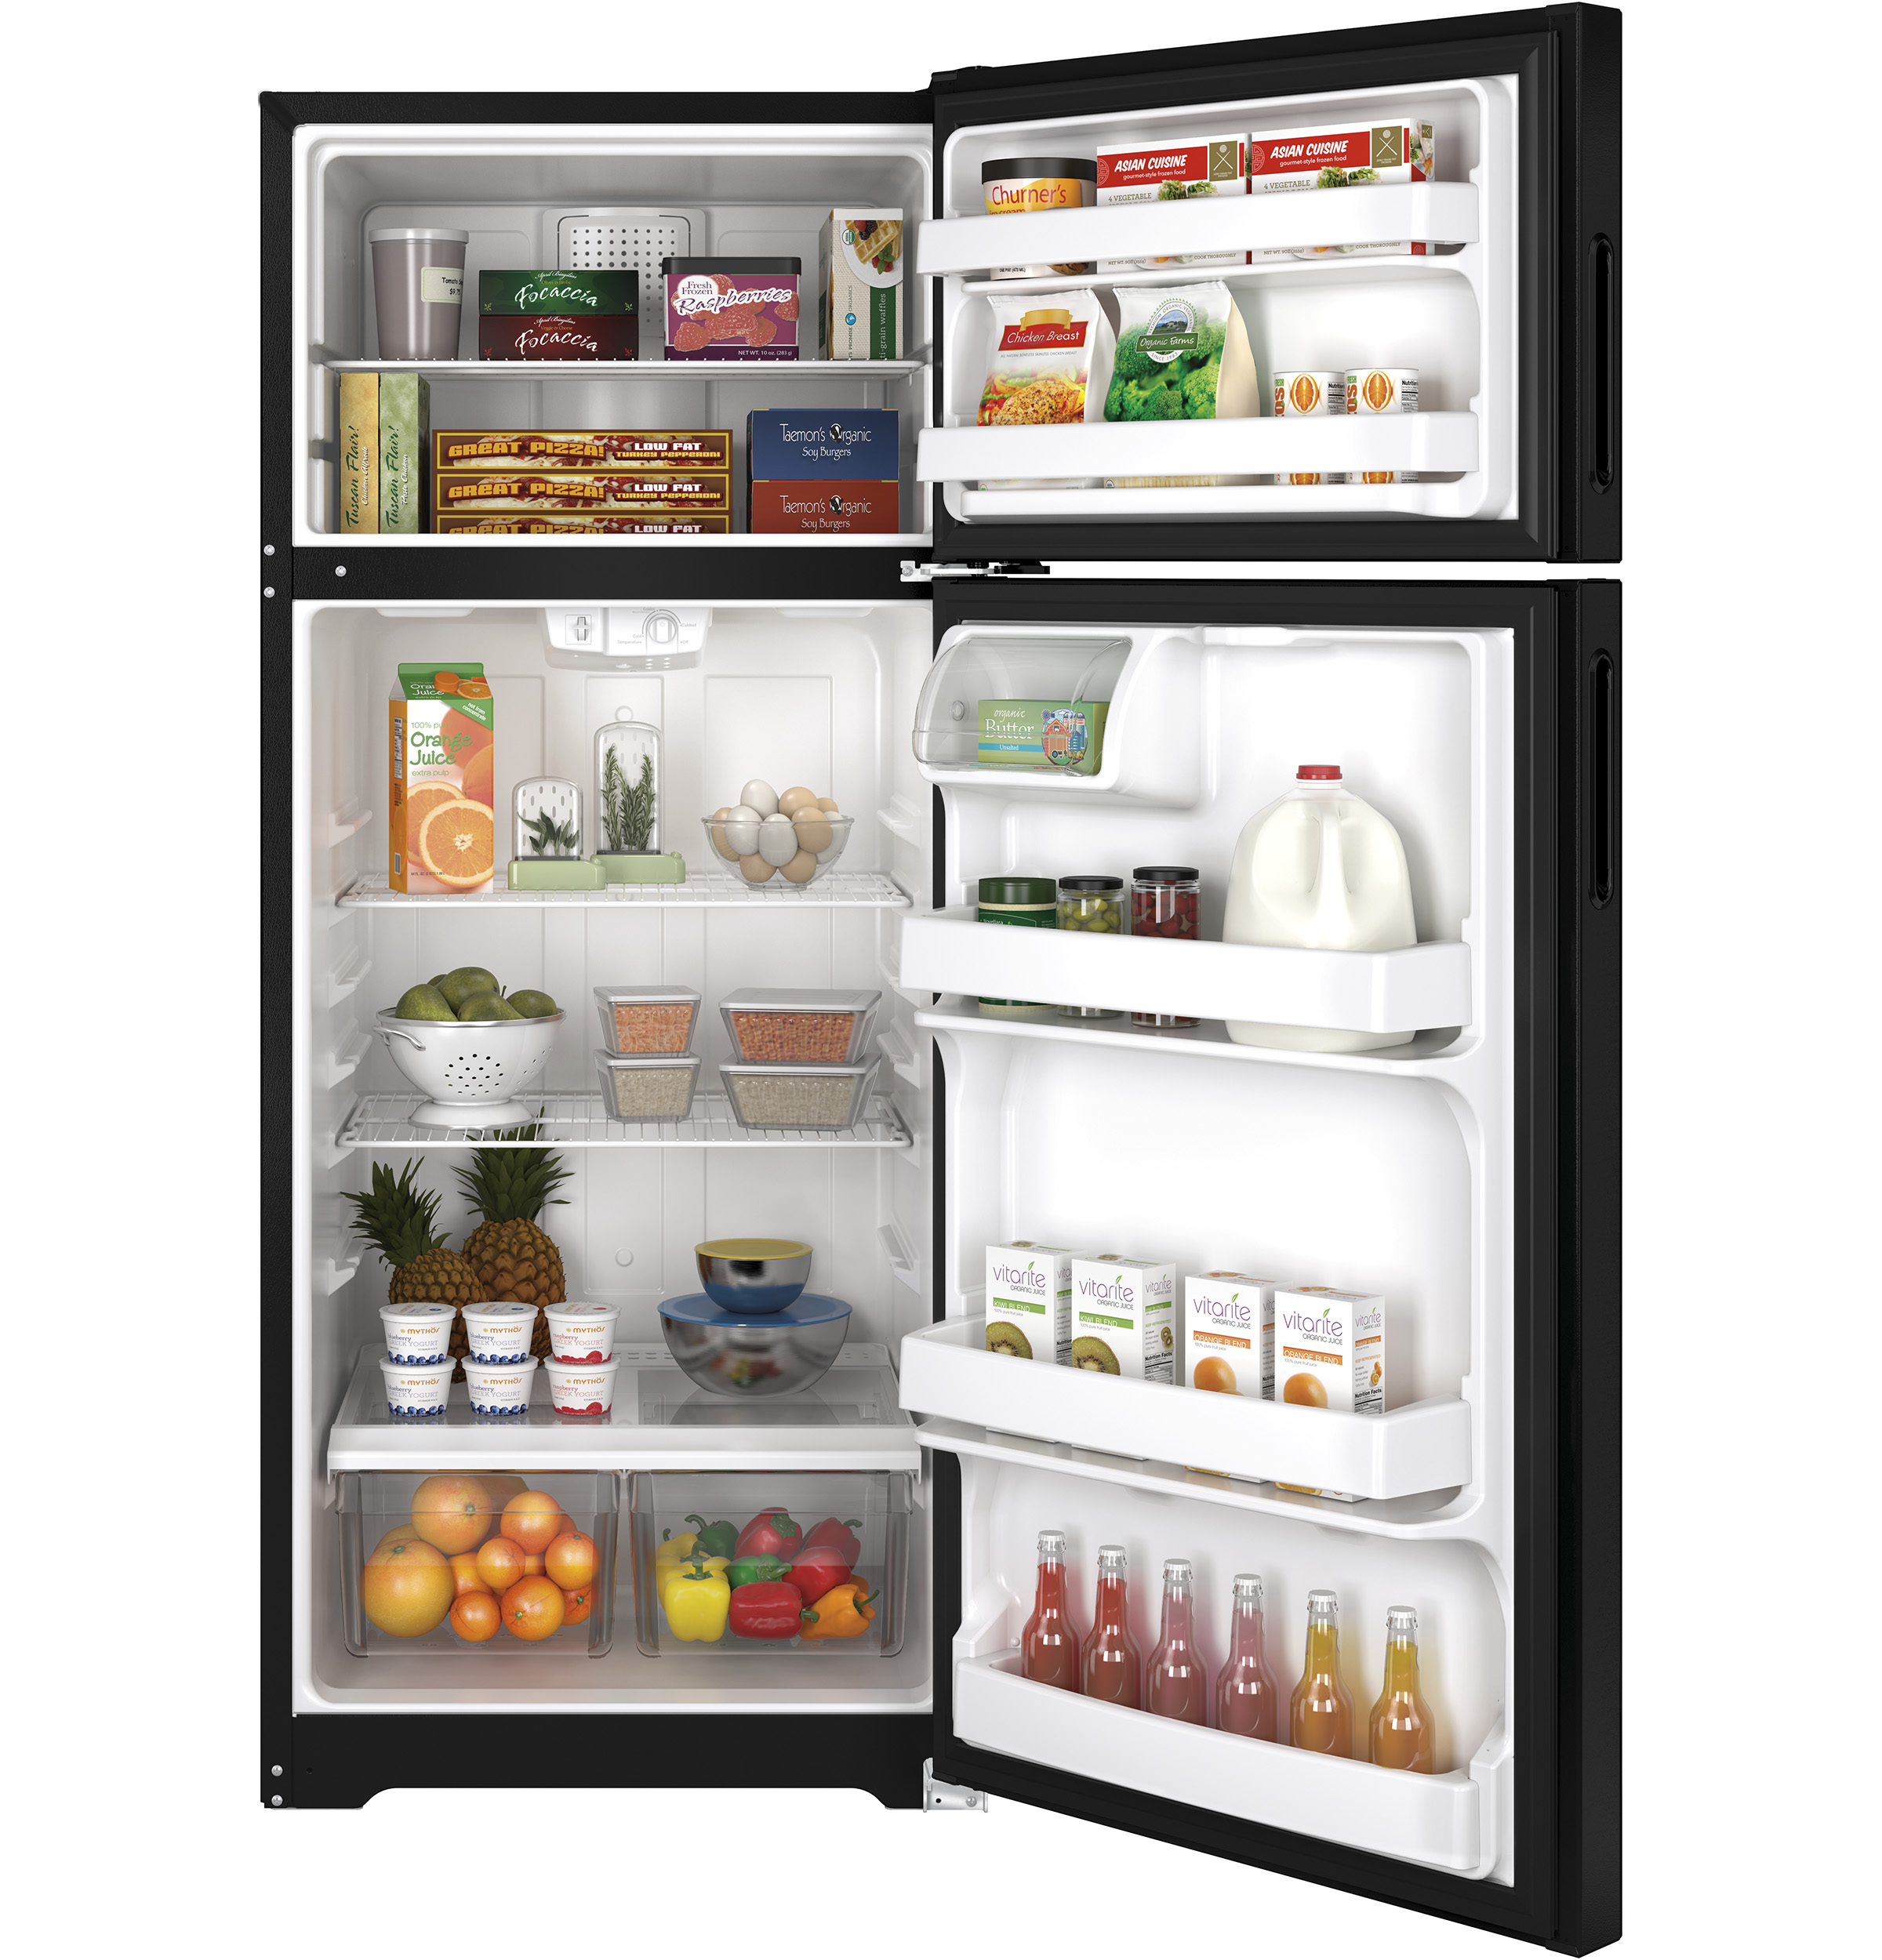 Hotpoint HPS18BTHBB 17.6 cu. ft. Top-Freezer Refrigerator - Black